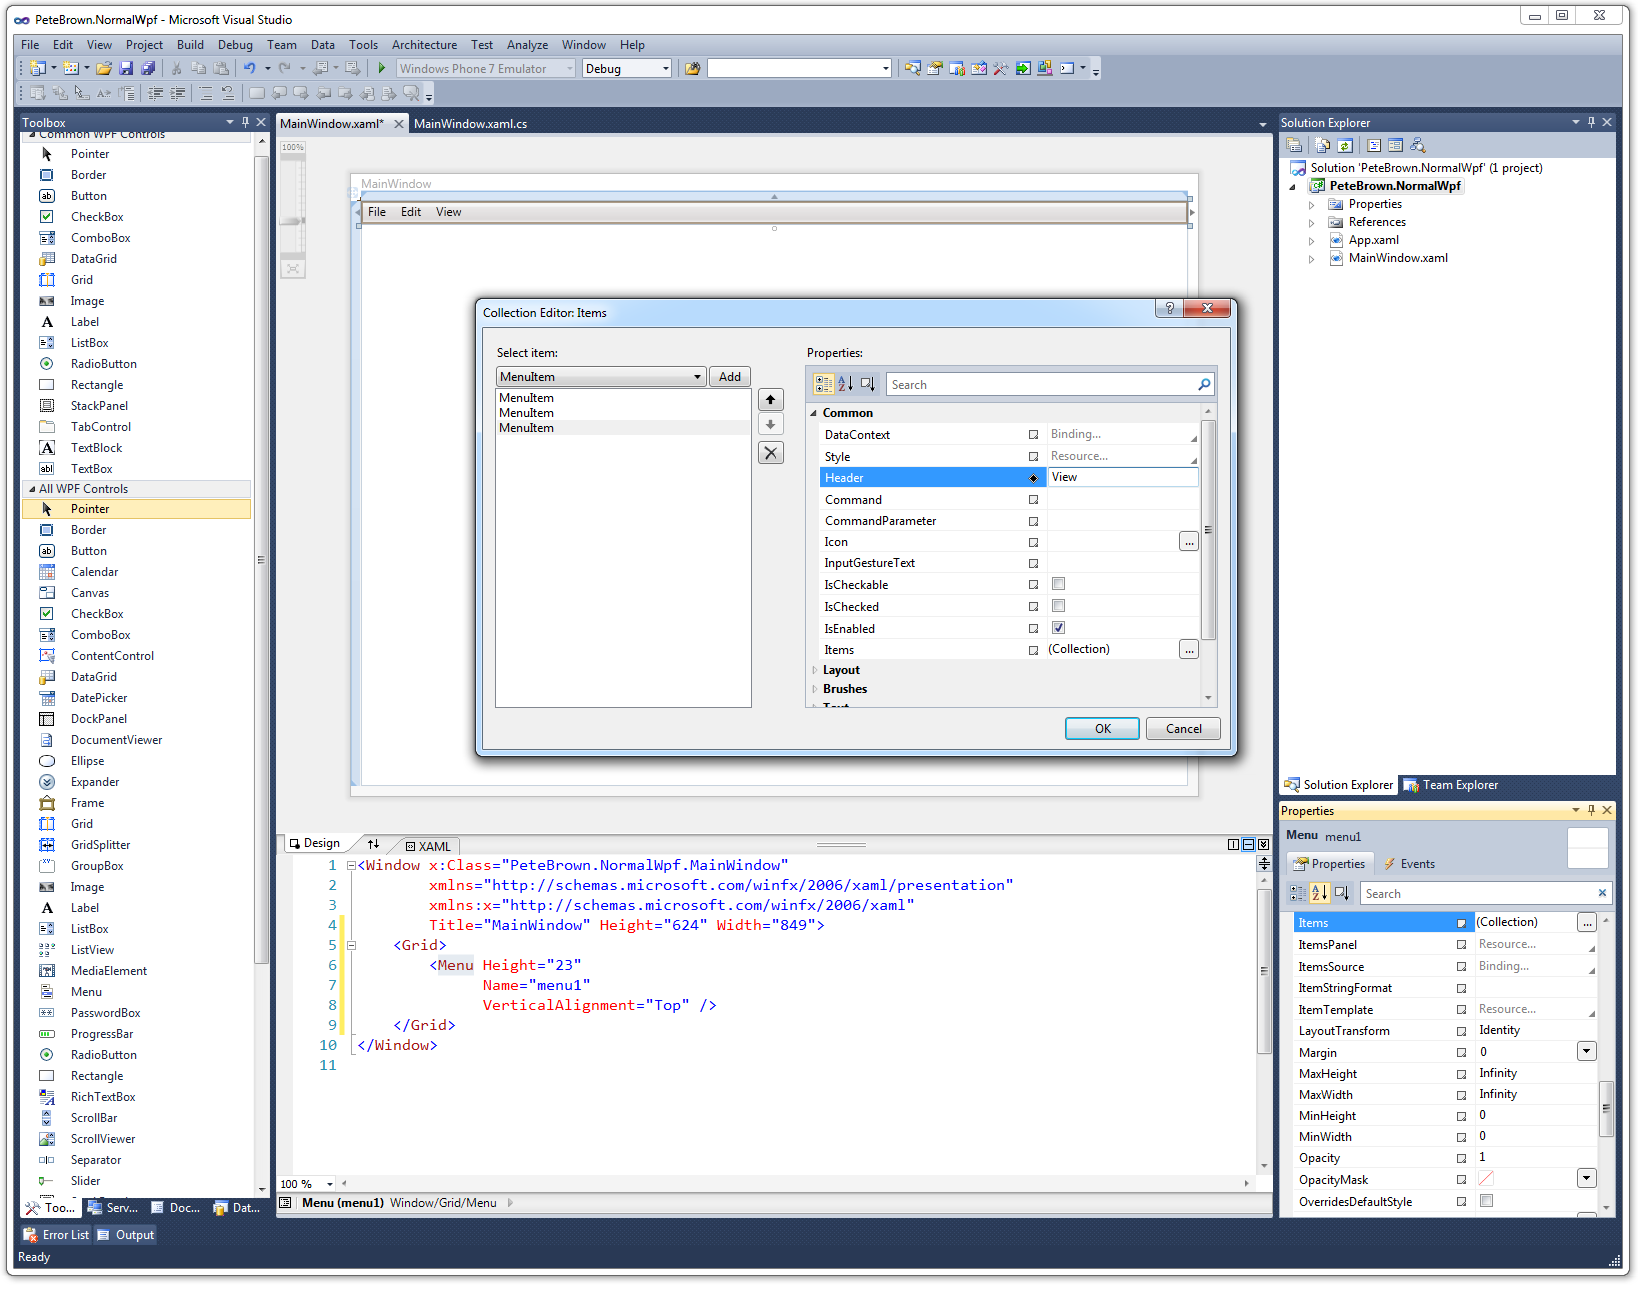 Windows Forms to XAML: Do I really need a Designer for